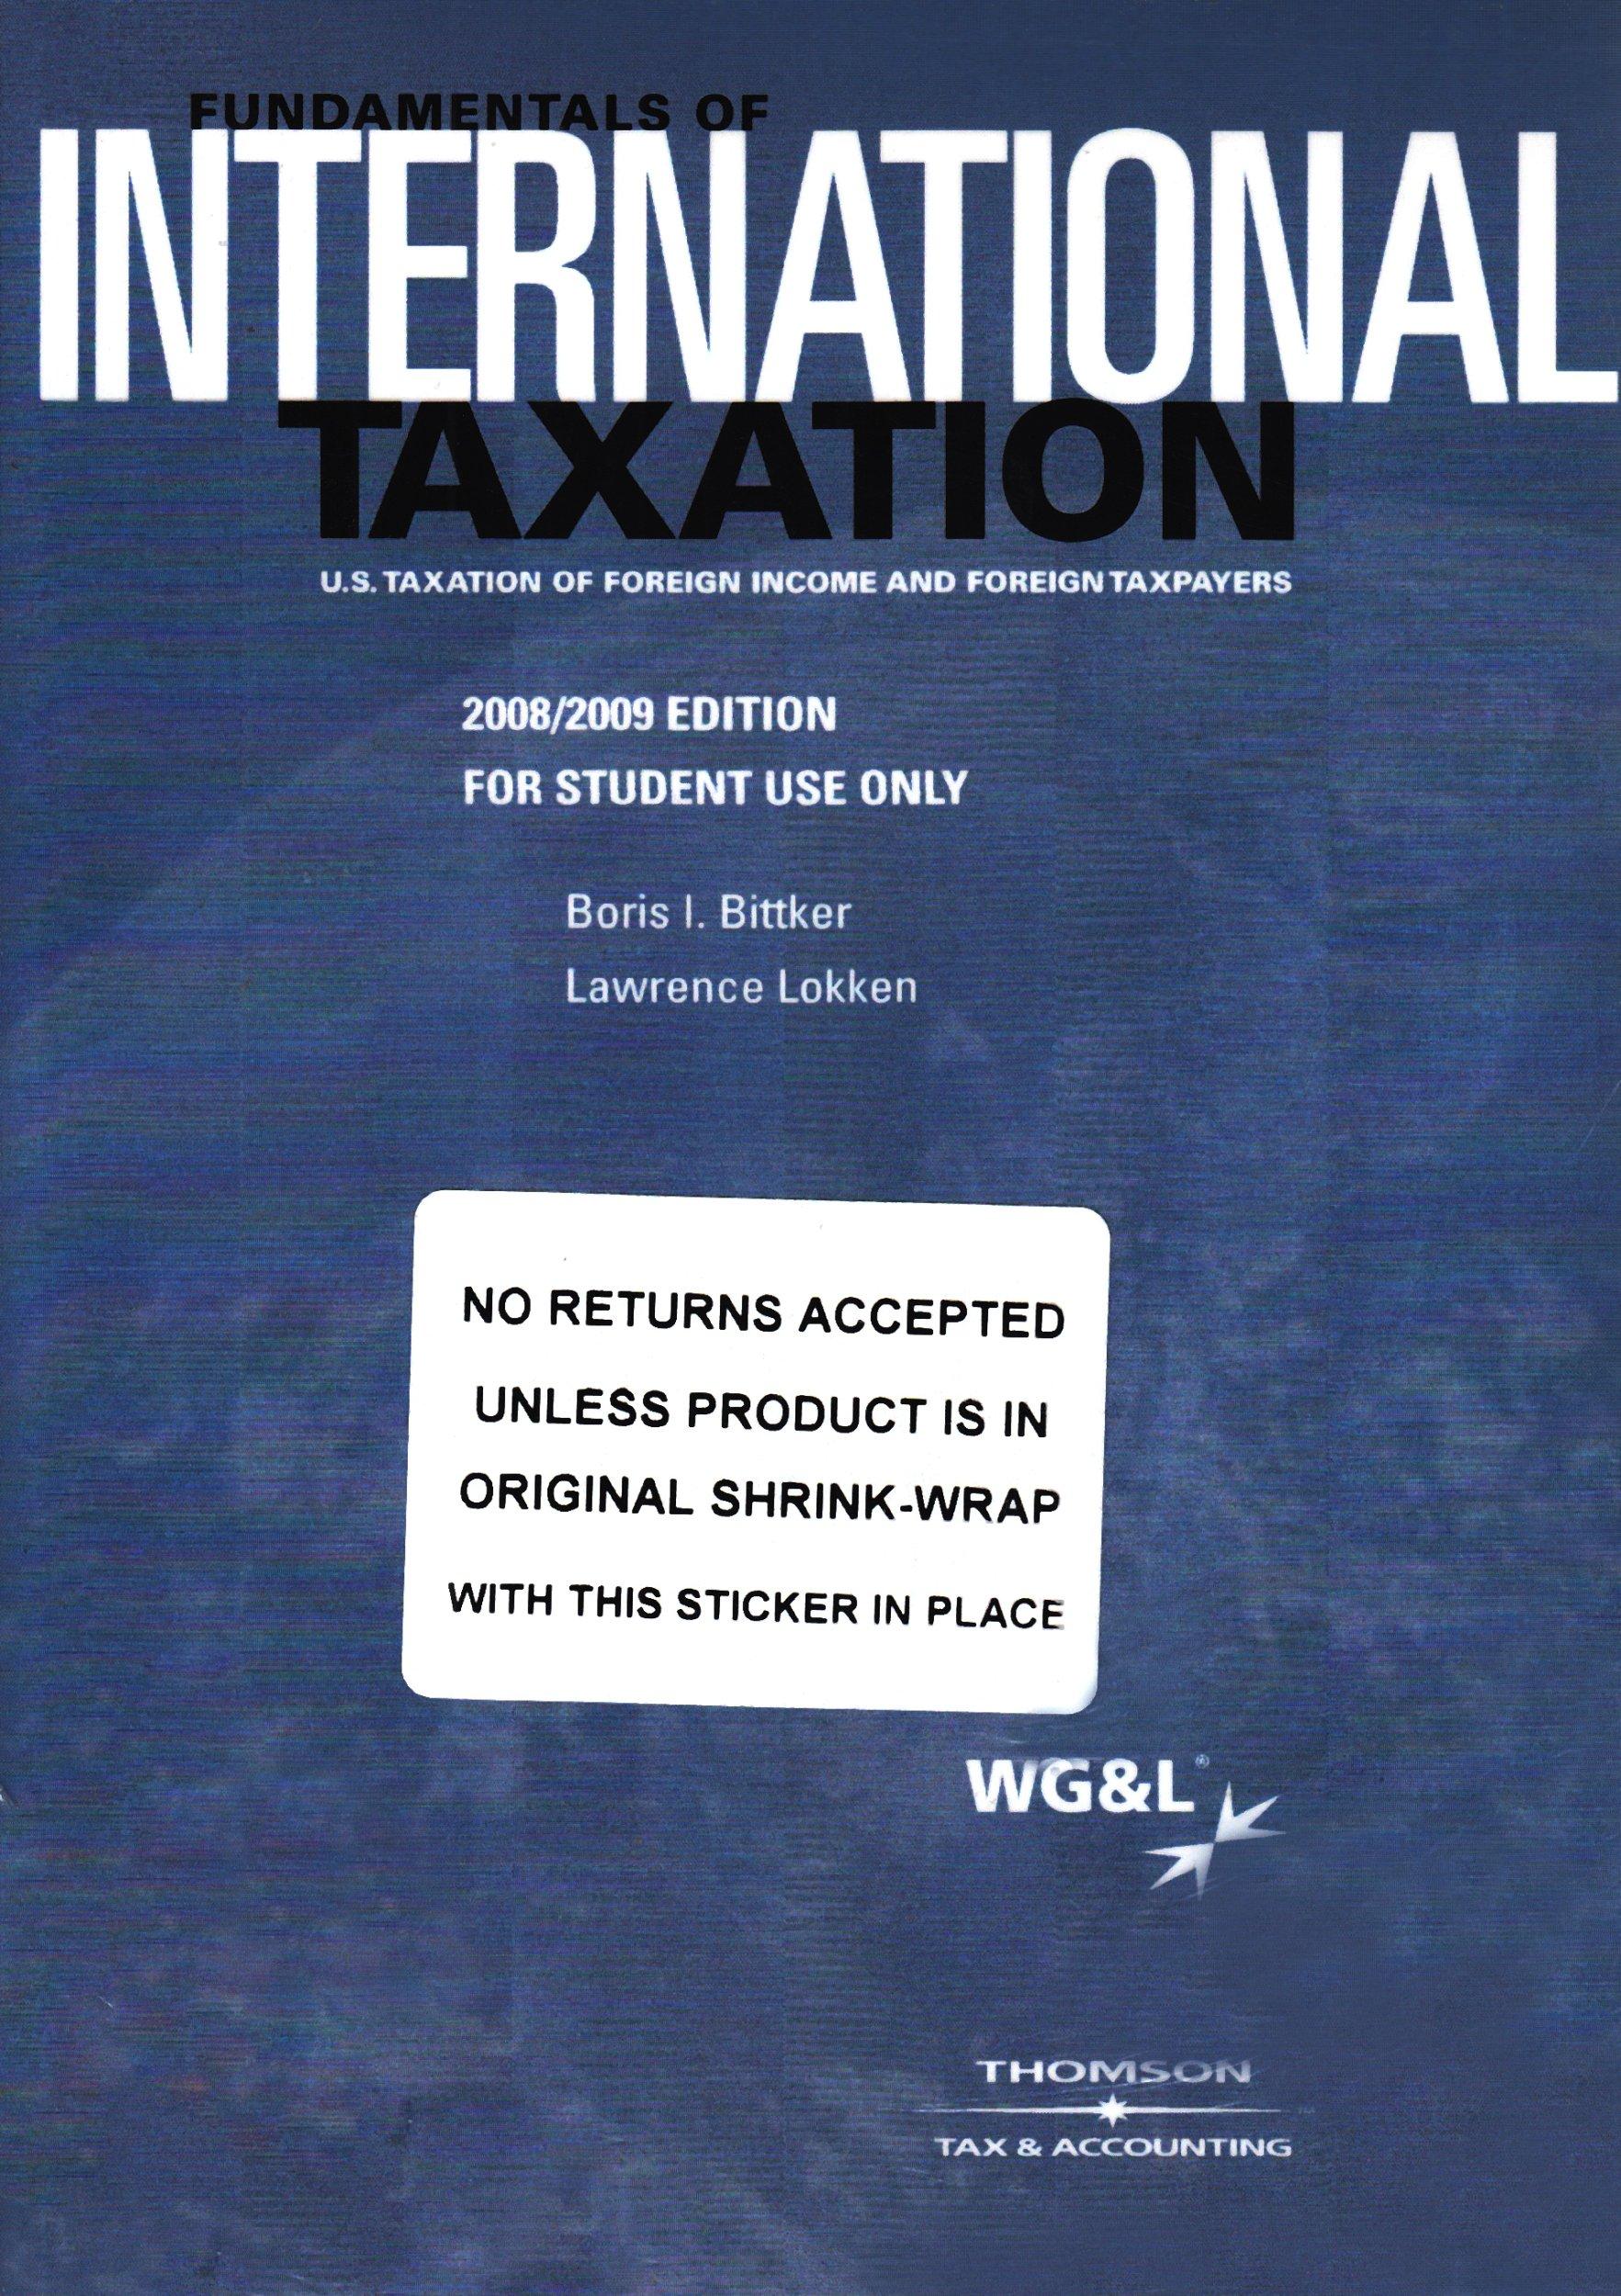 Fundamentals of International Taxation pdf